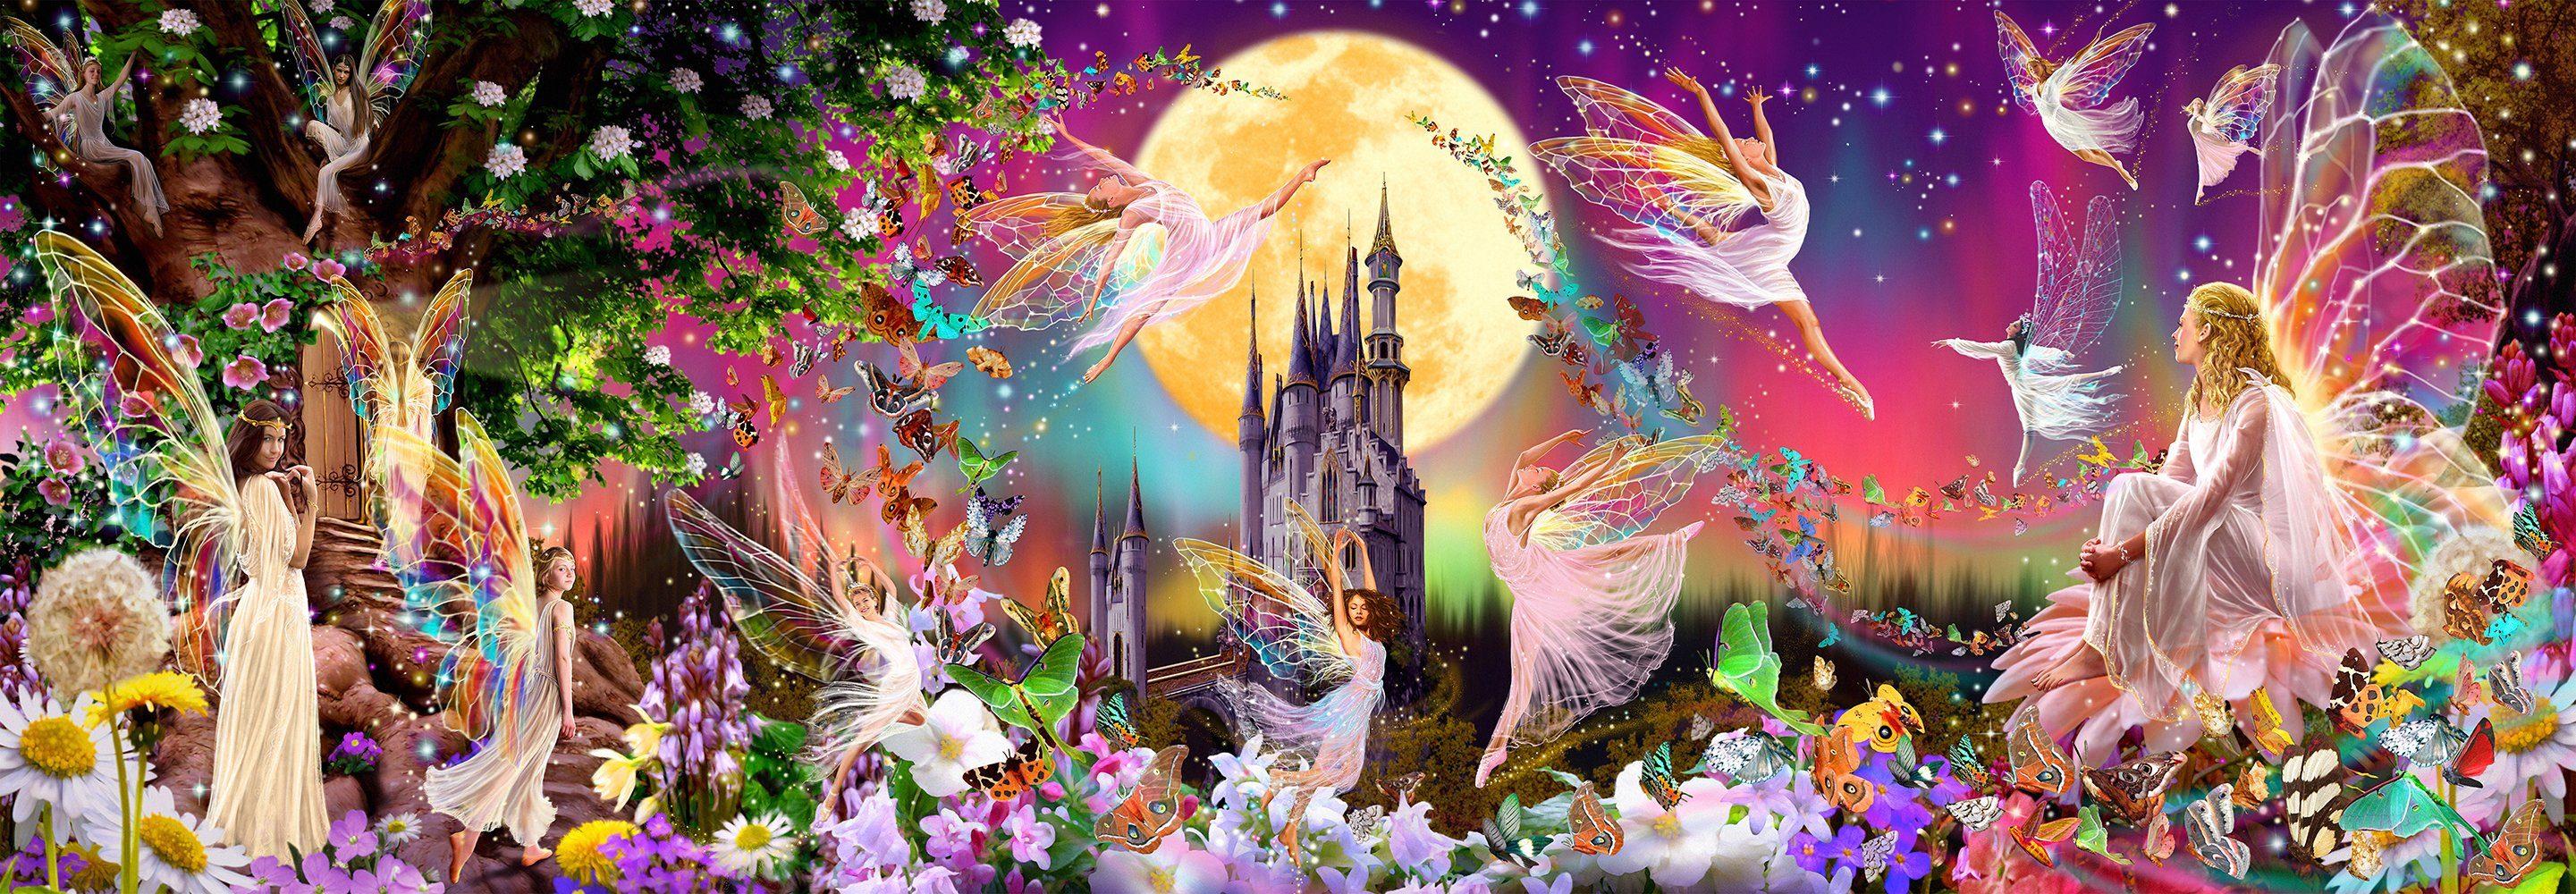 IDEALDECOR Fototapete »Fairyland«, 4-teilig, 366x127 cm